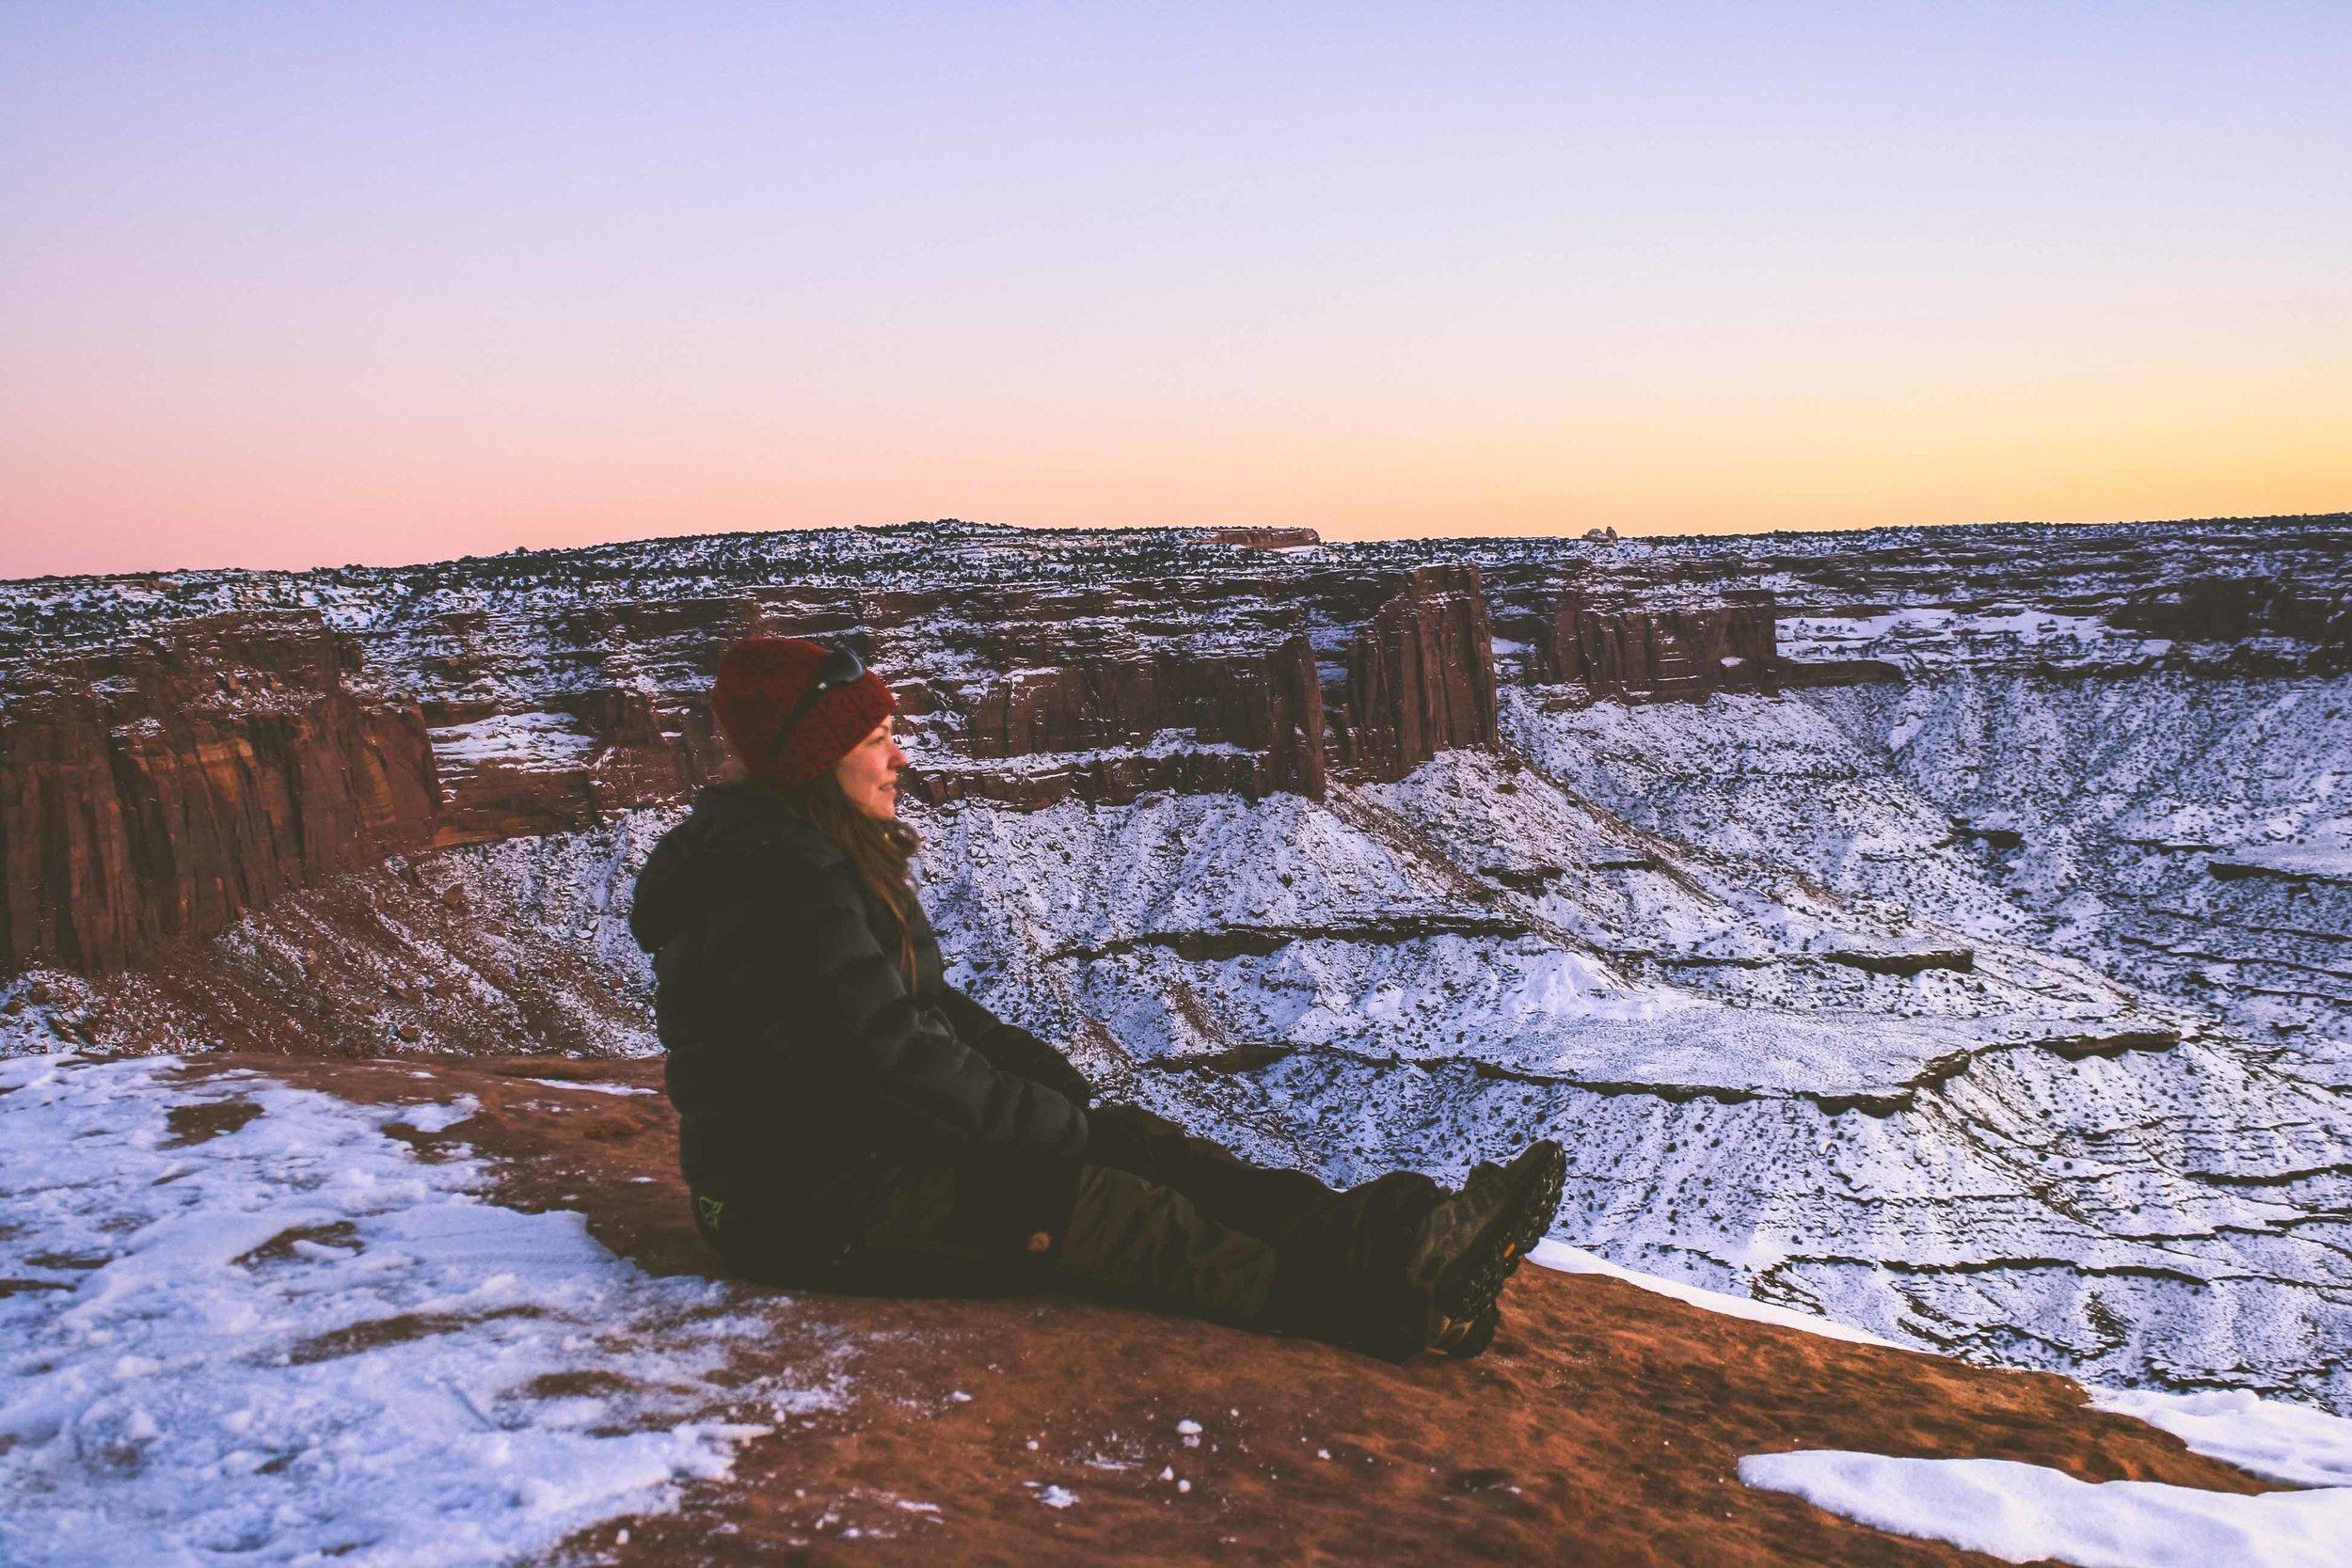 Canyonlands National Park, Utah. January 2013